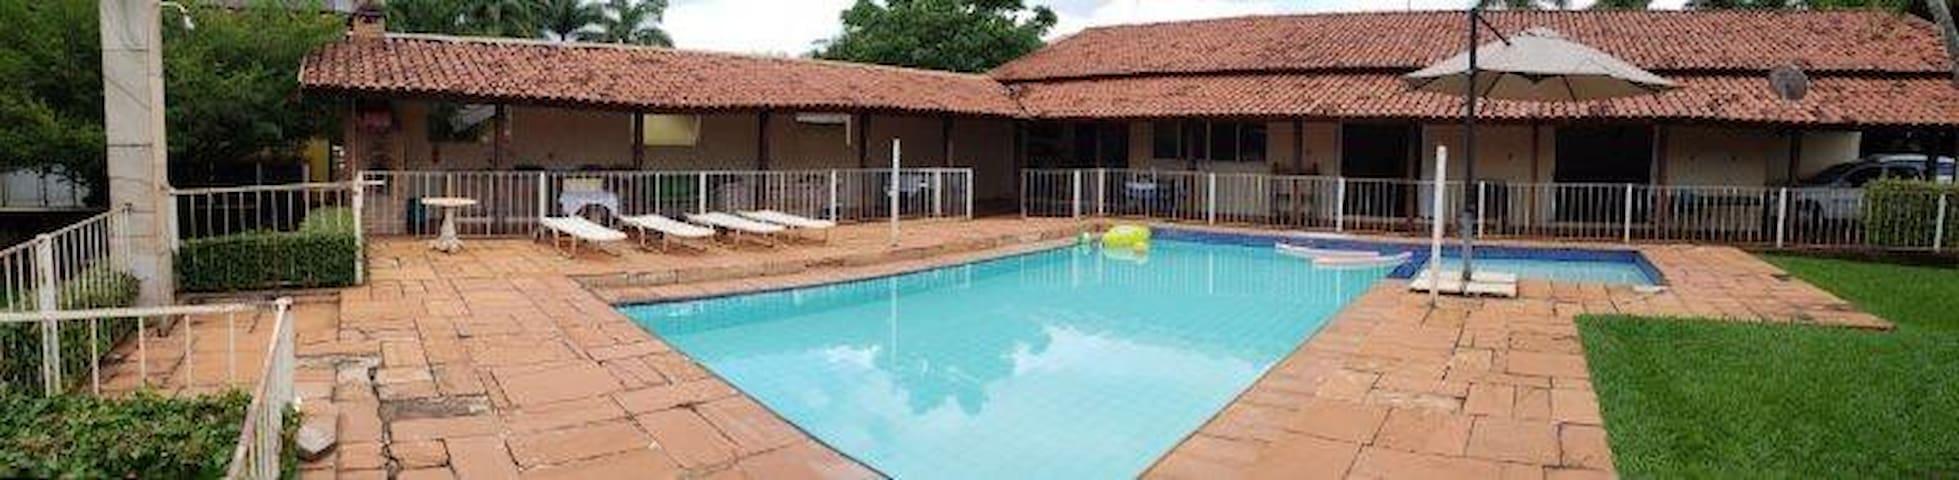 Vista piscina para a varanda